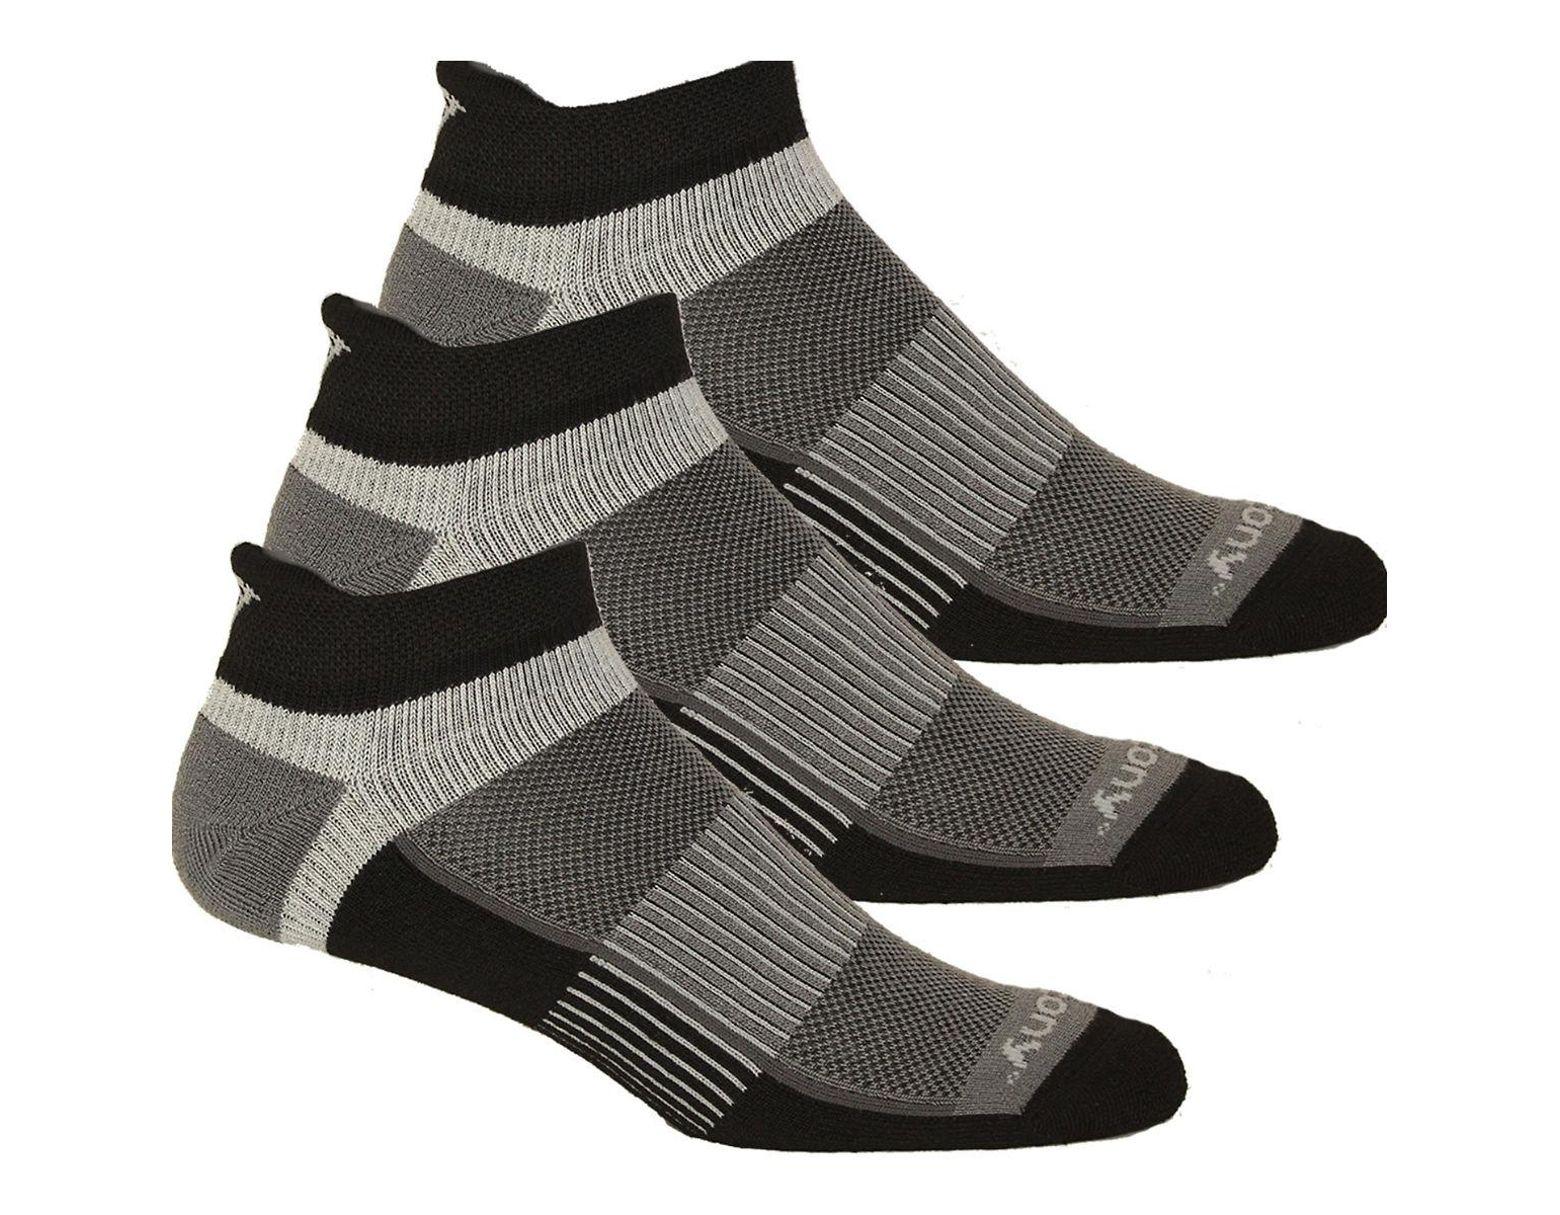 04aadea6 Men's Black Inferno No Show Tab 3-pack Socks